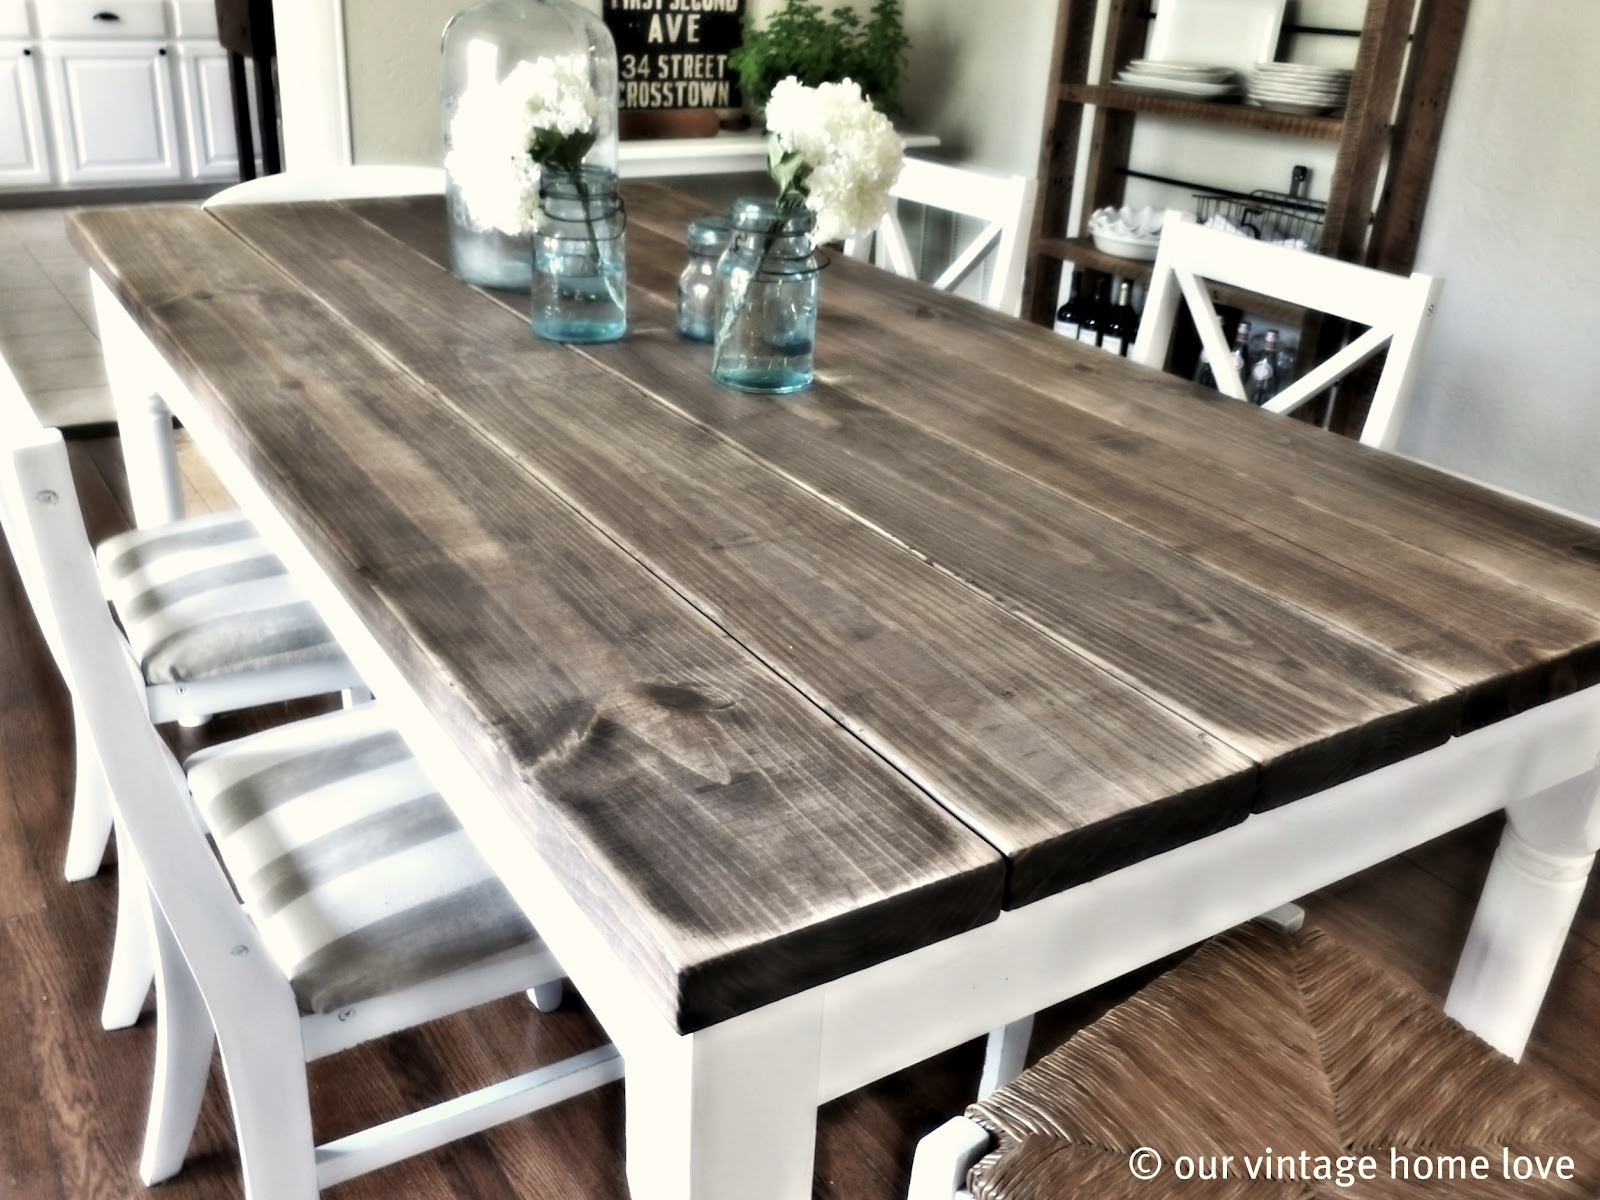 Vintage Home Love: Dining Room Table Tutorial